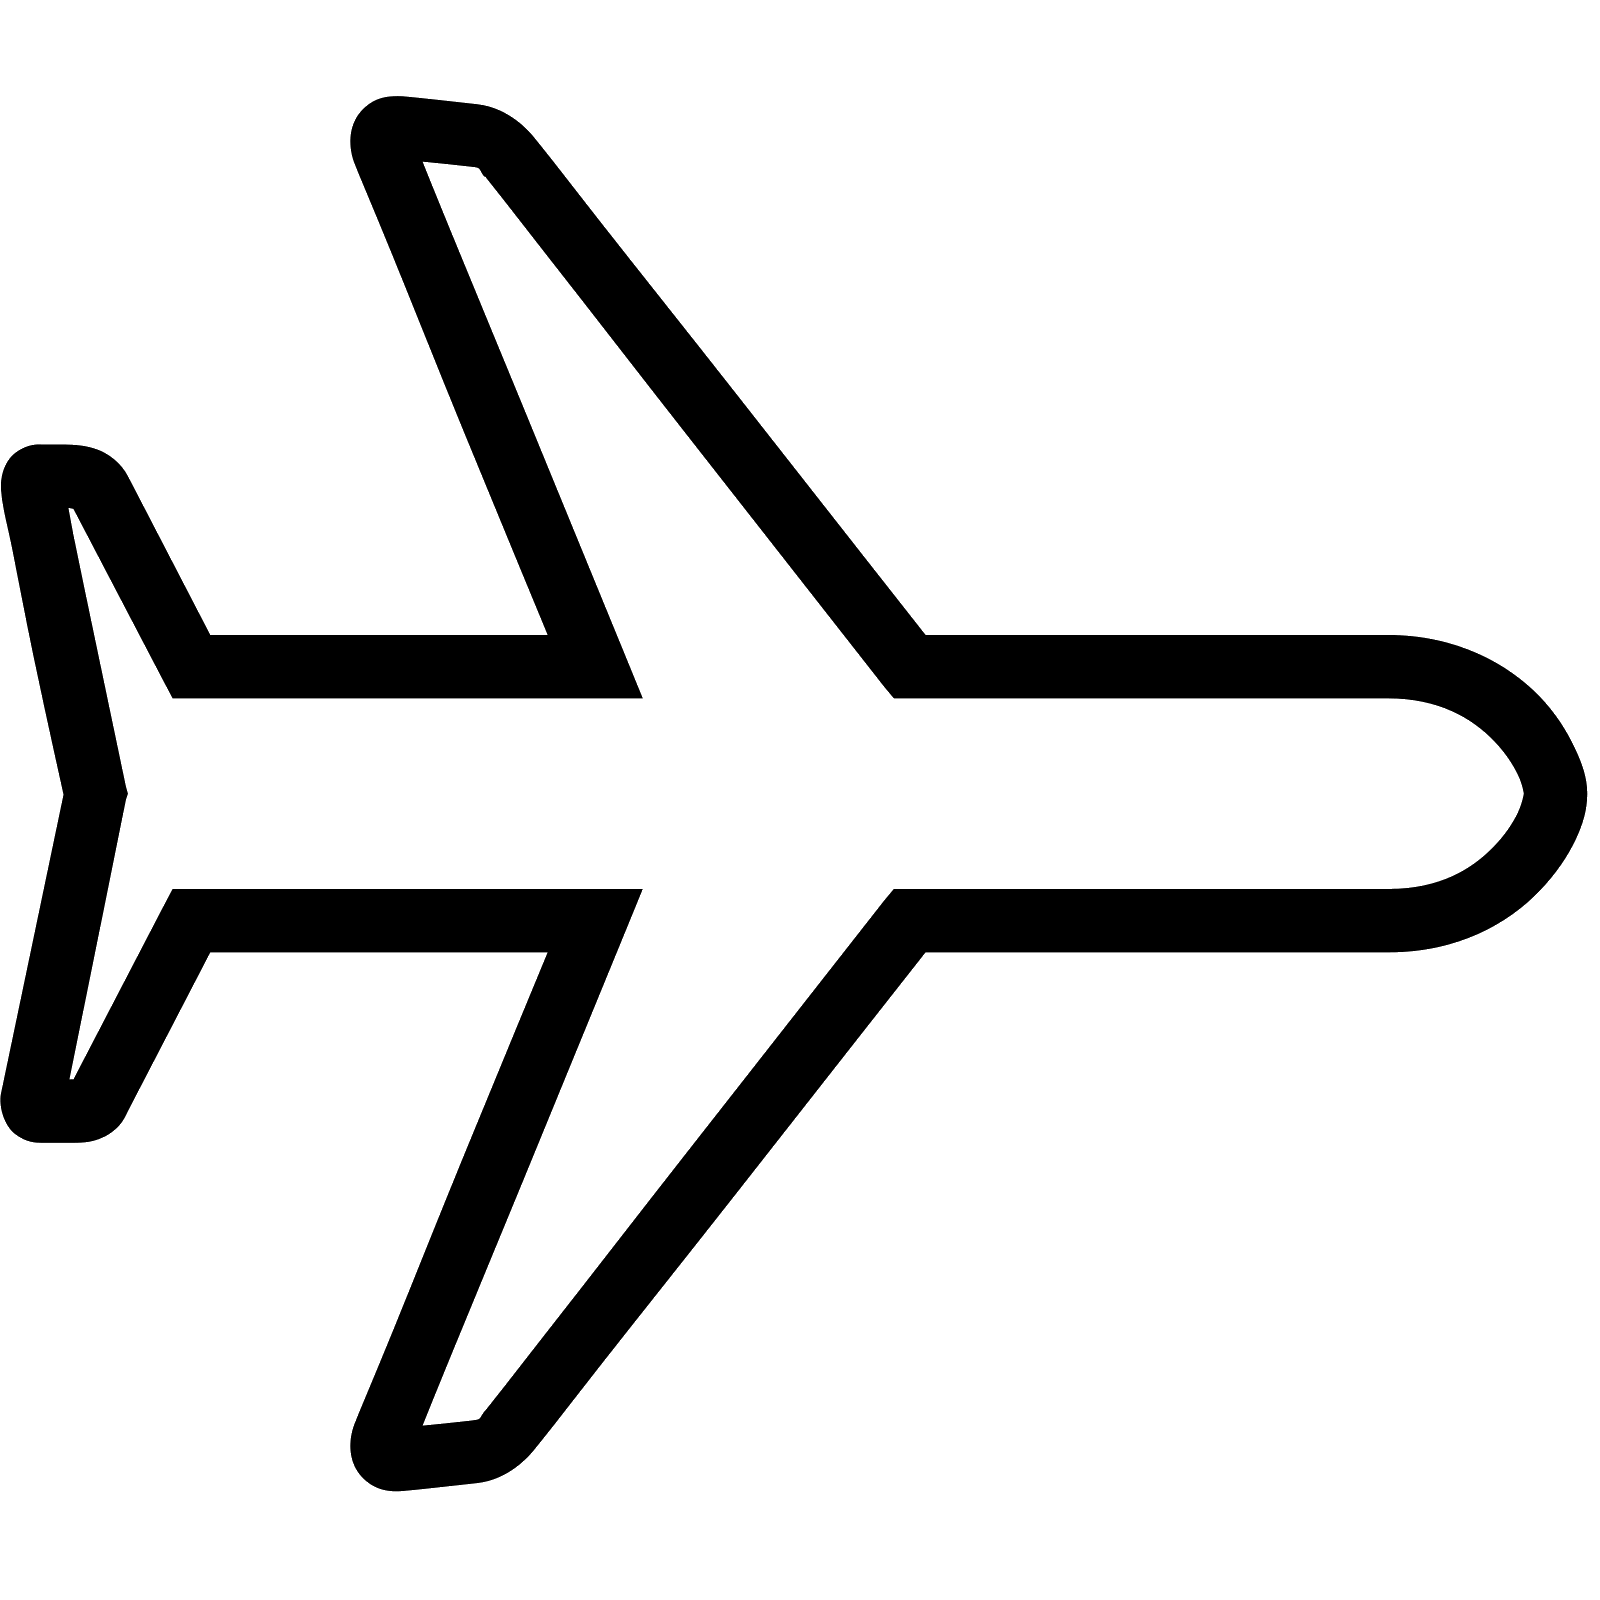 Emoji clipart plane. Airplane mode on icon